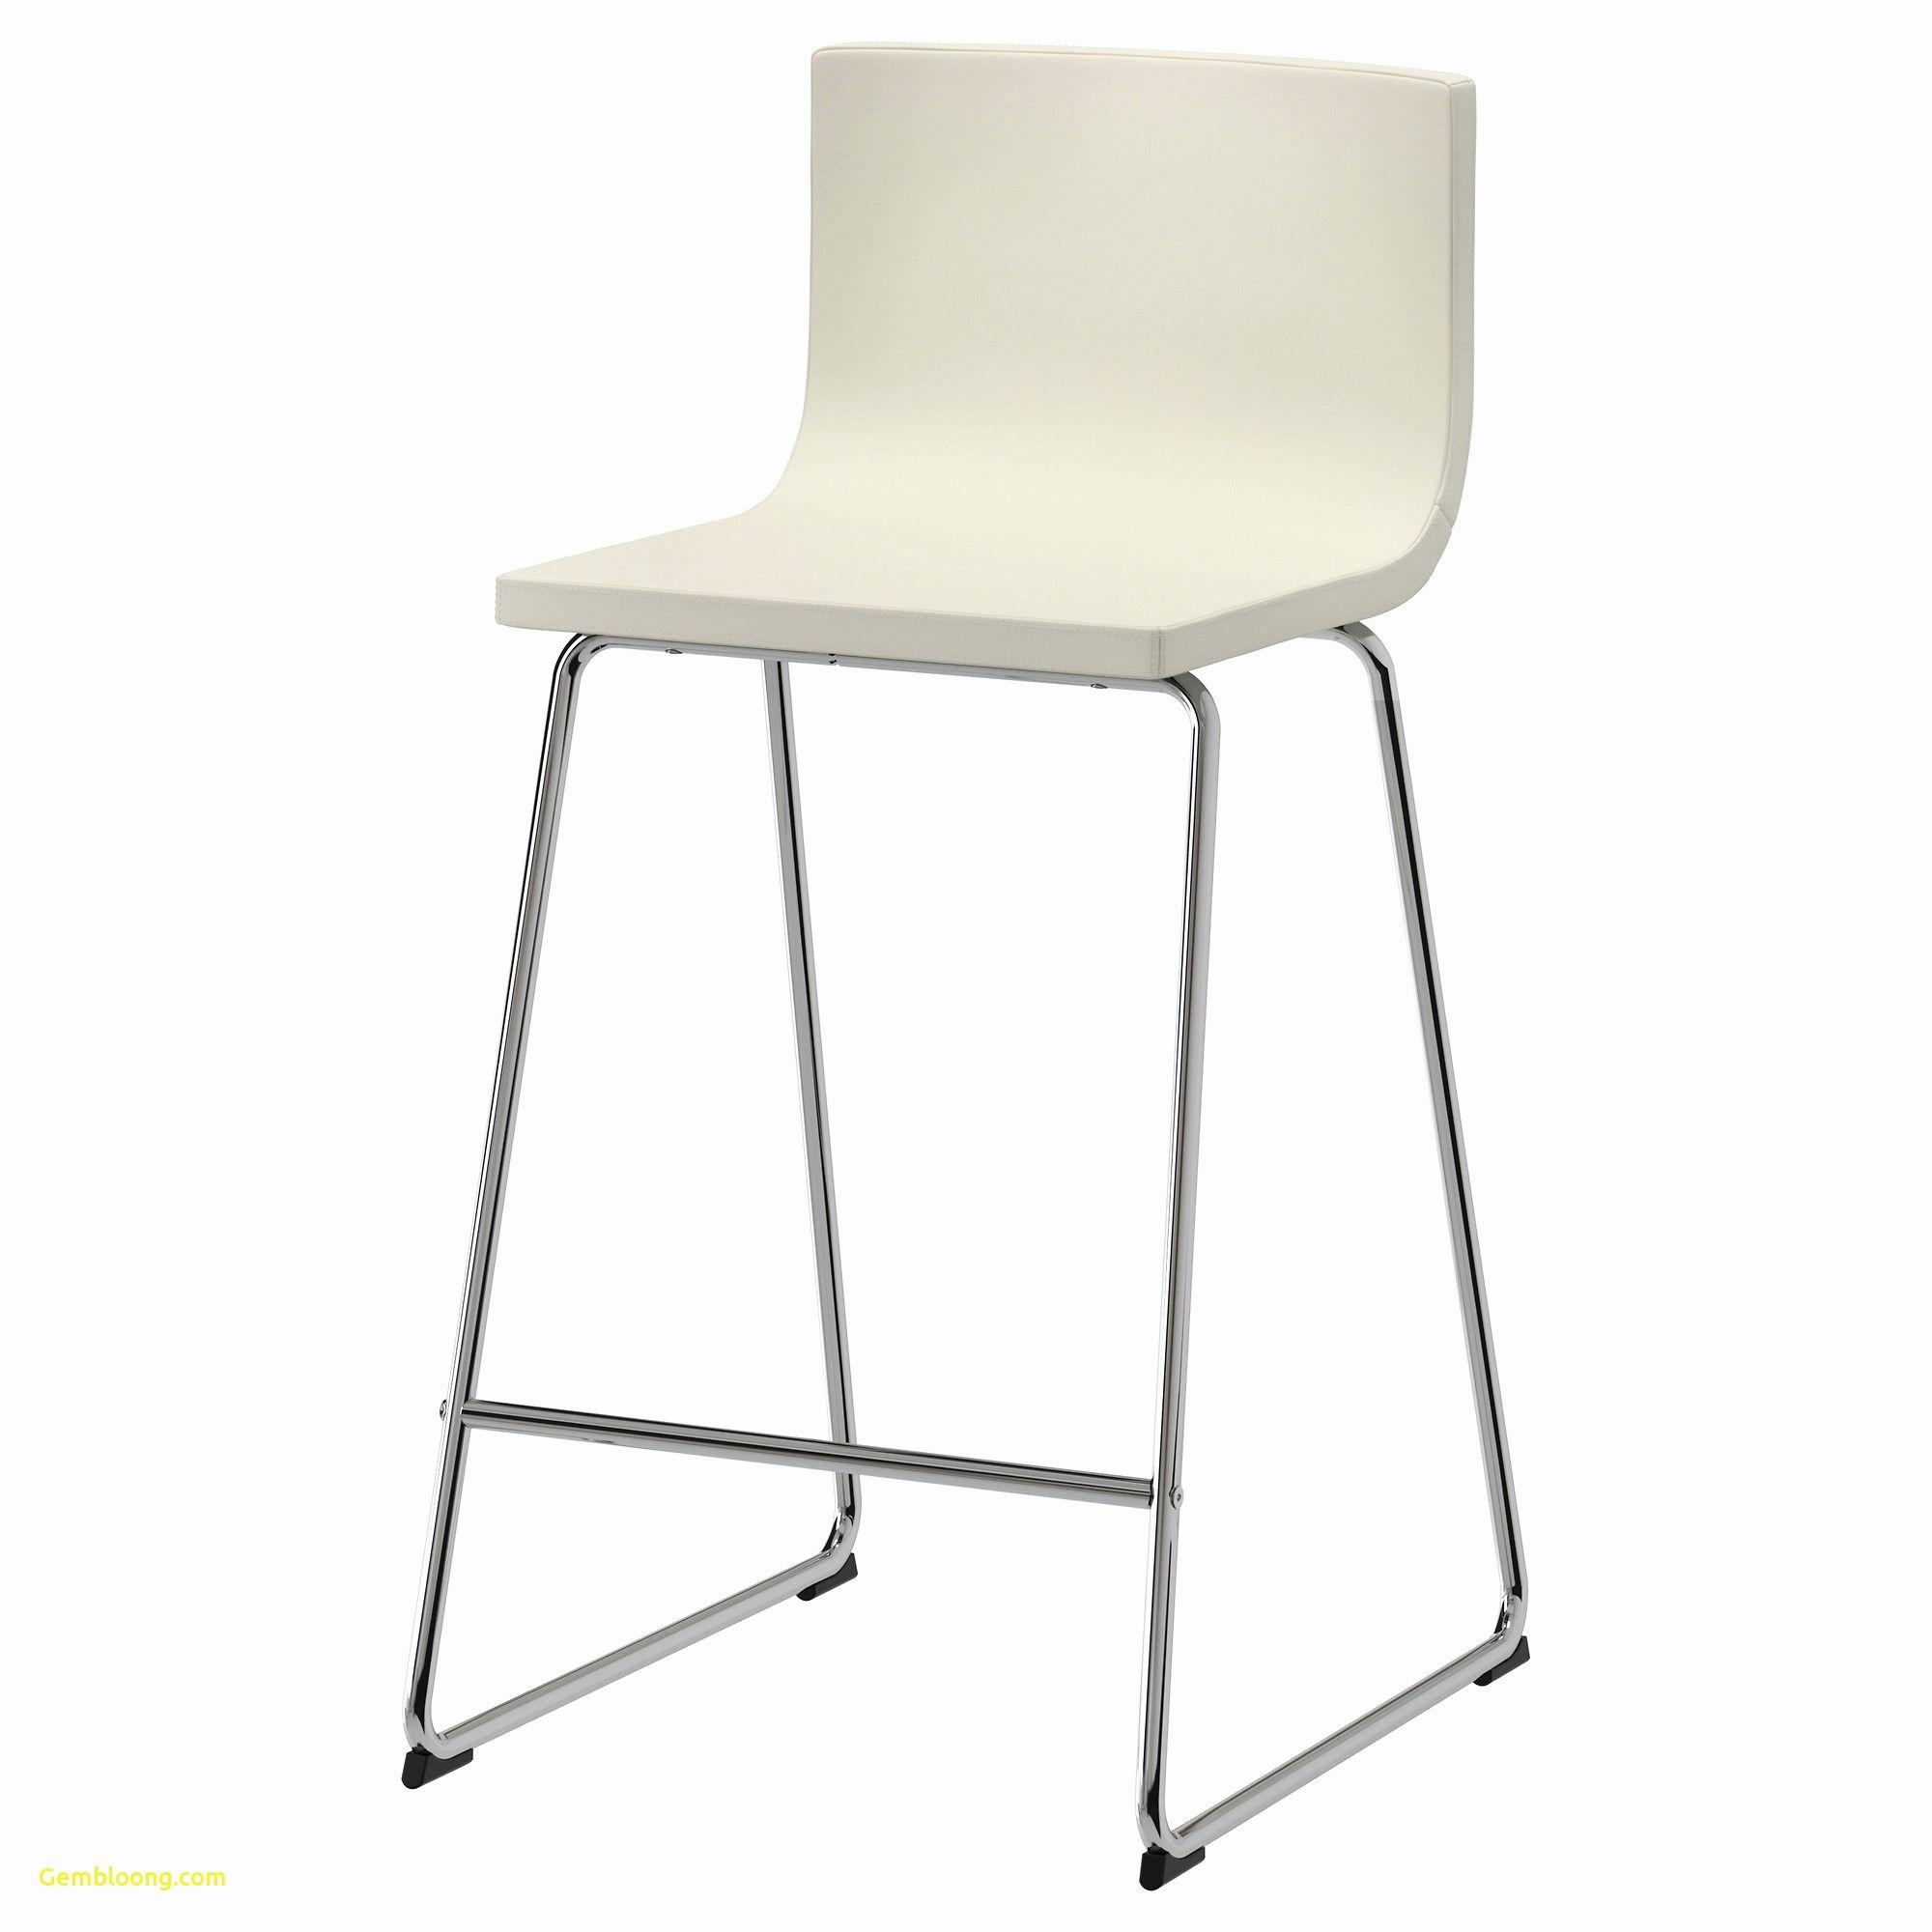 Pin By Npisg On Kitchen Furniture Bar Stools Stool Ikea Barstools